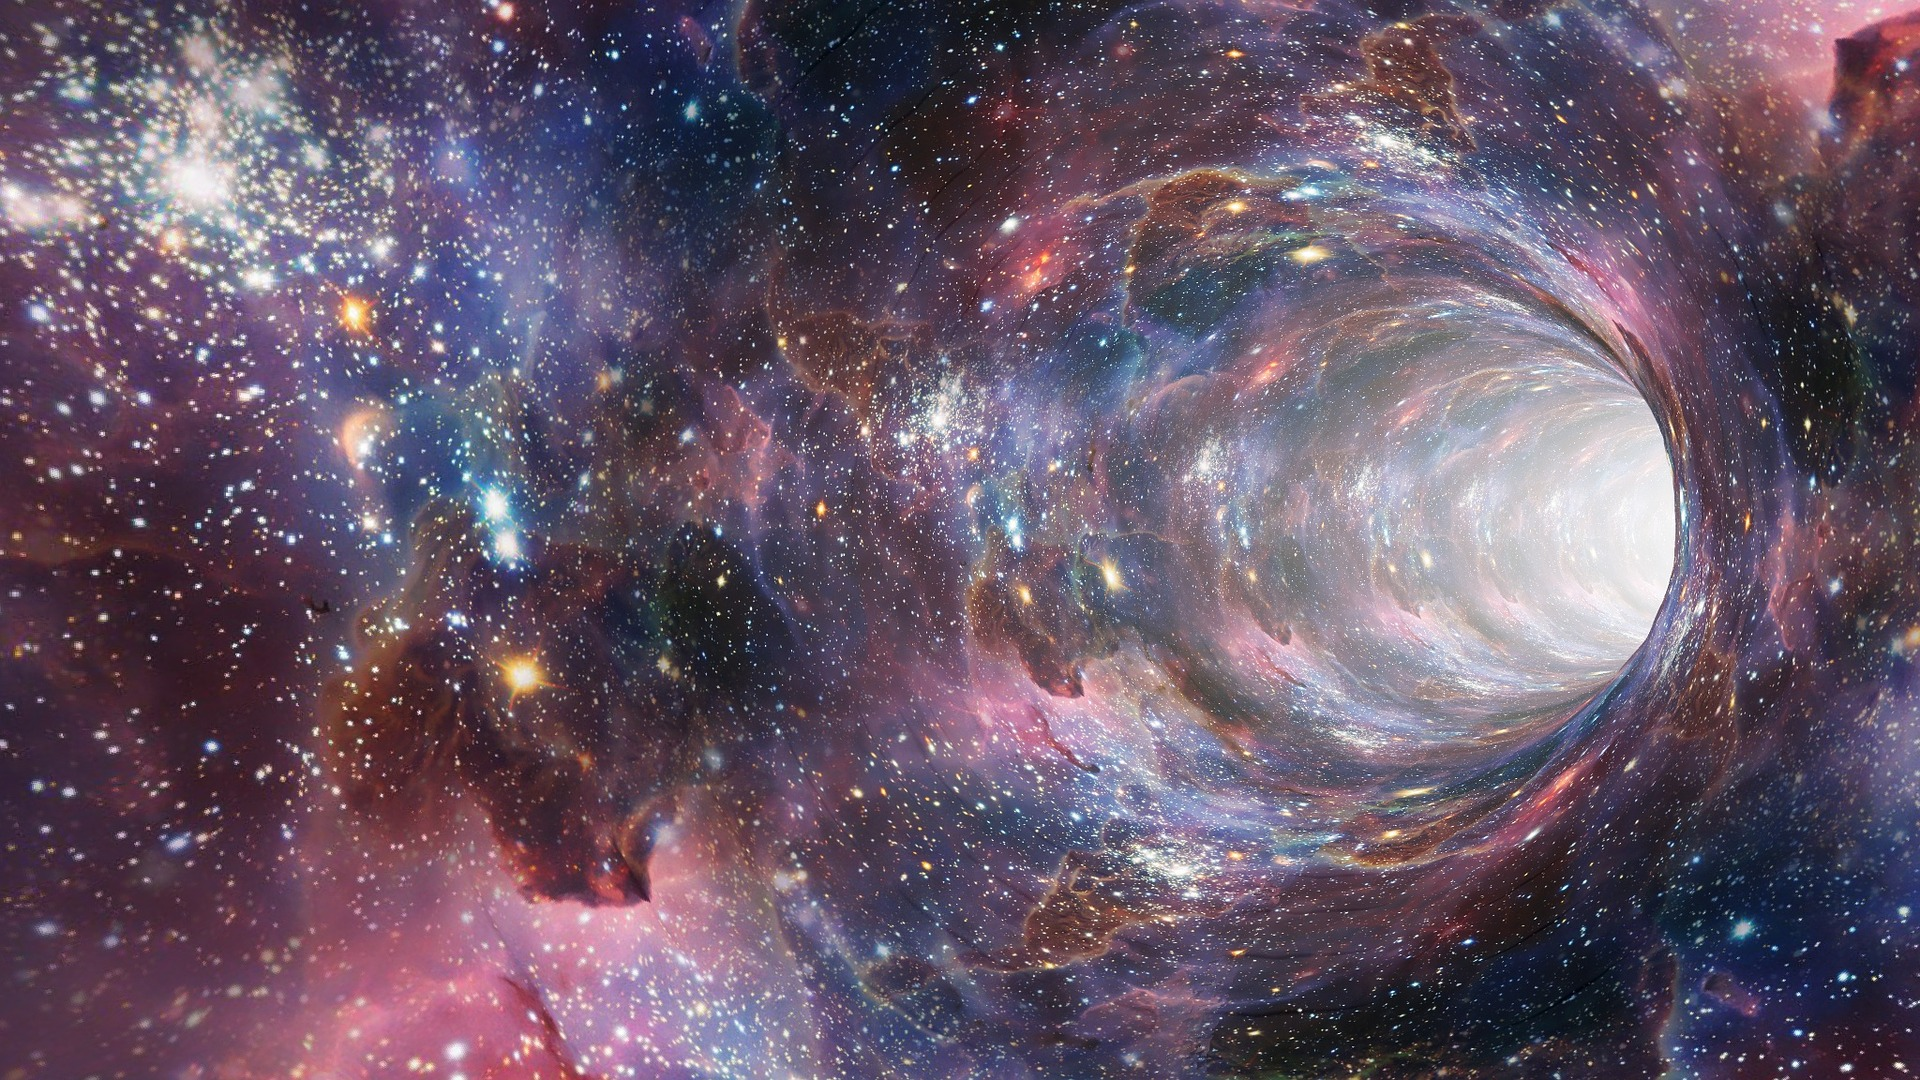 wormhole-2514312_1920.jpg